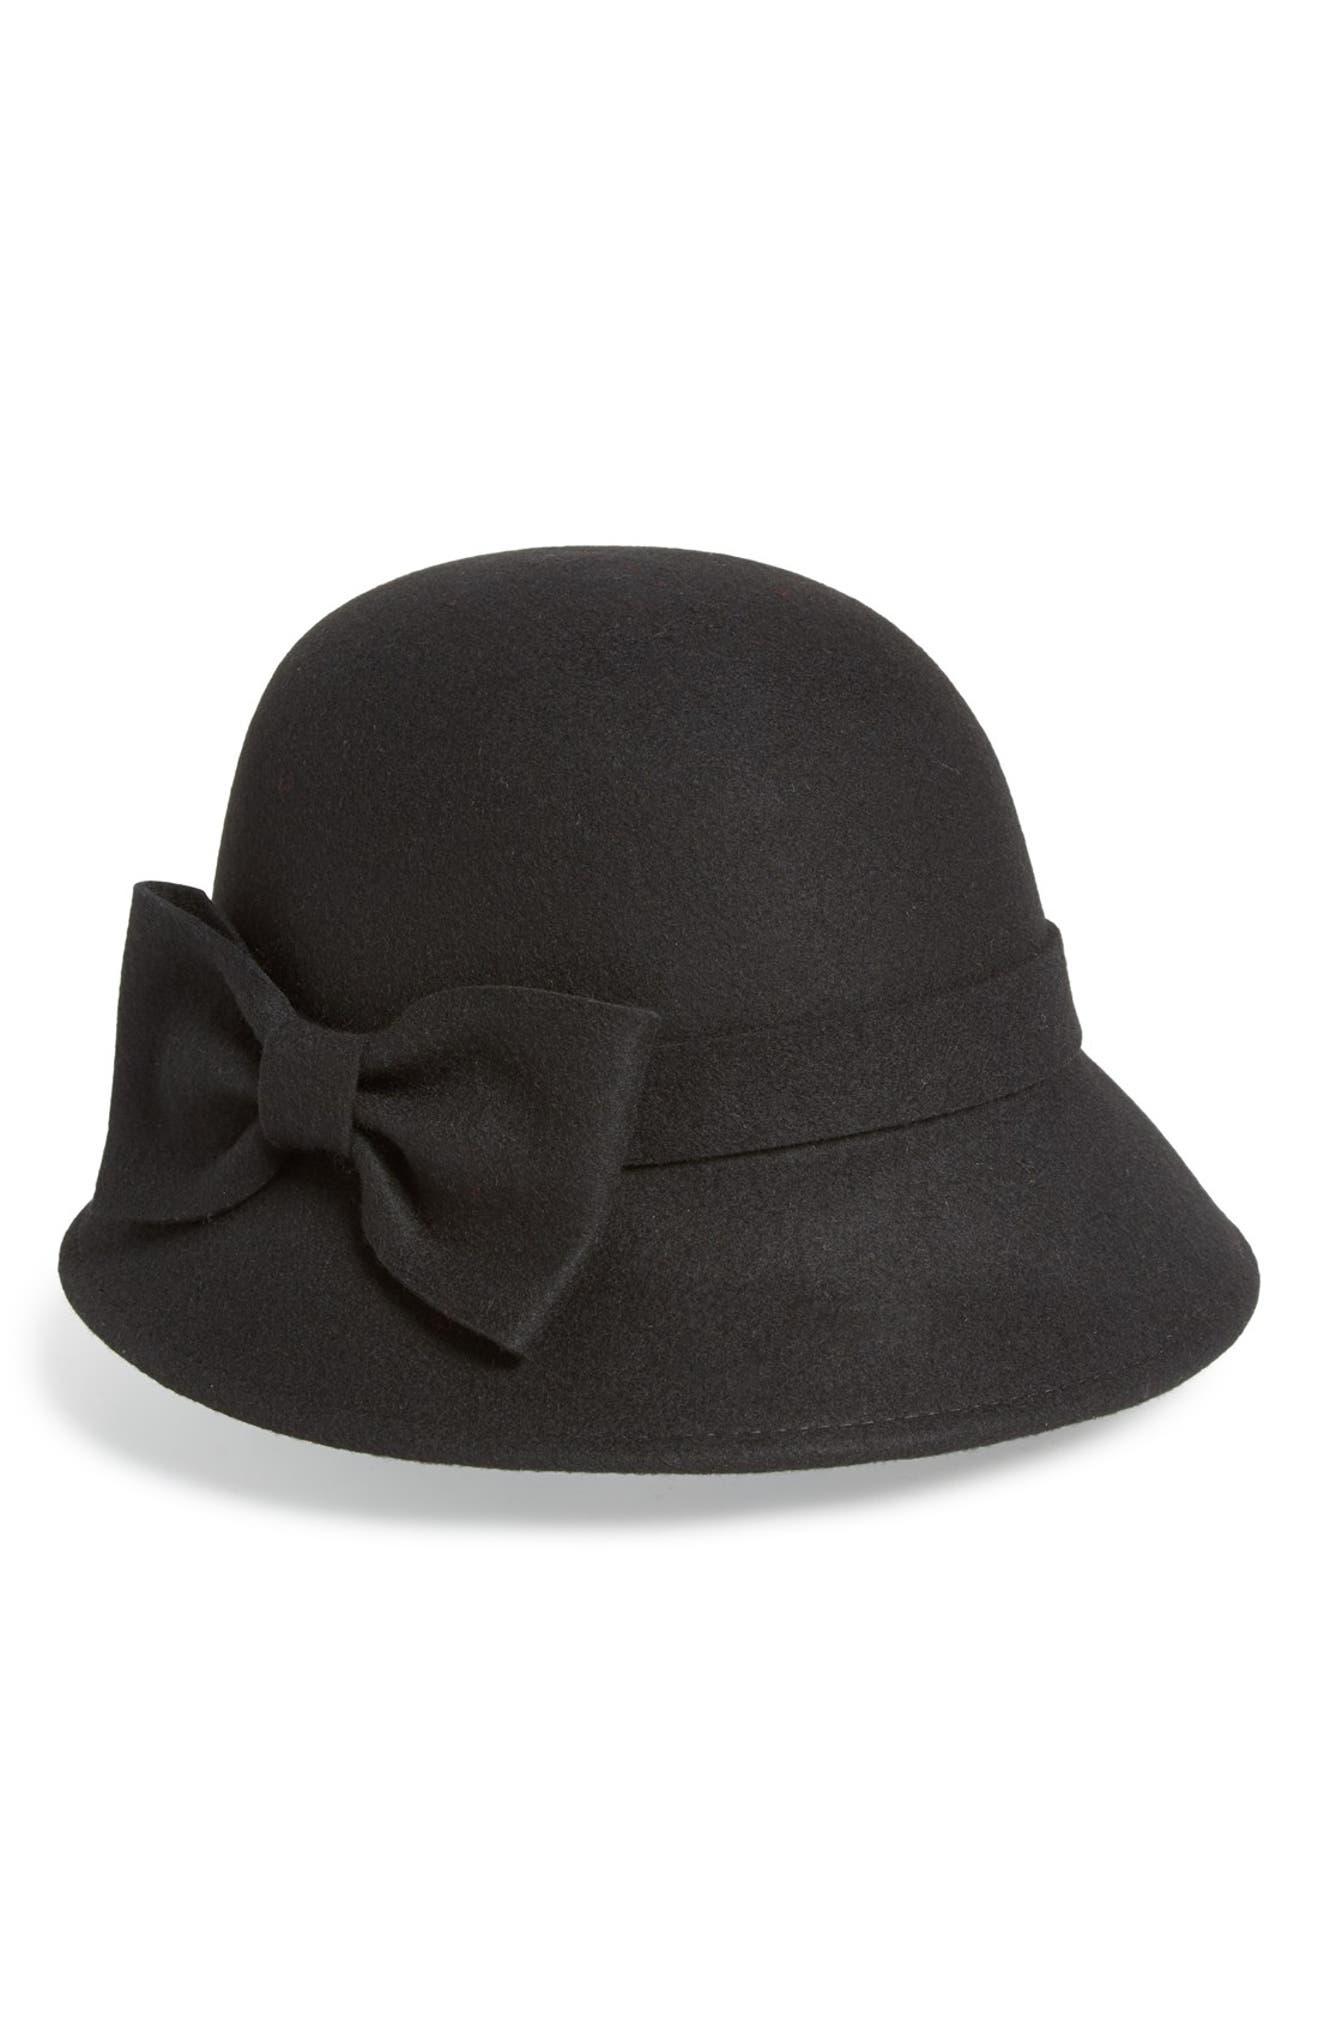 bfefa2794b4 kate spade new york felted wool downbrim hat